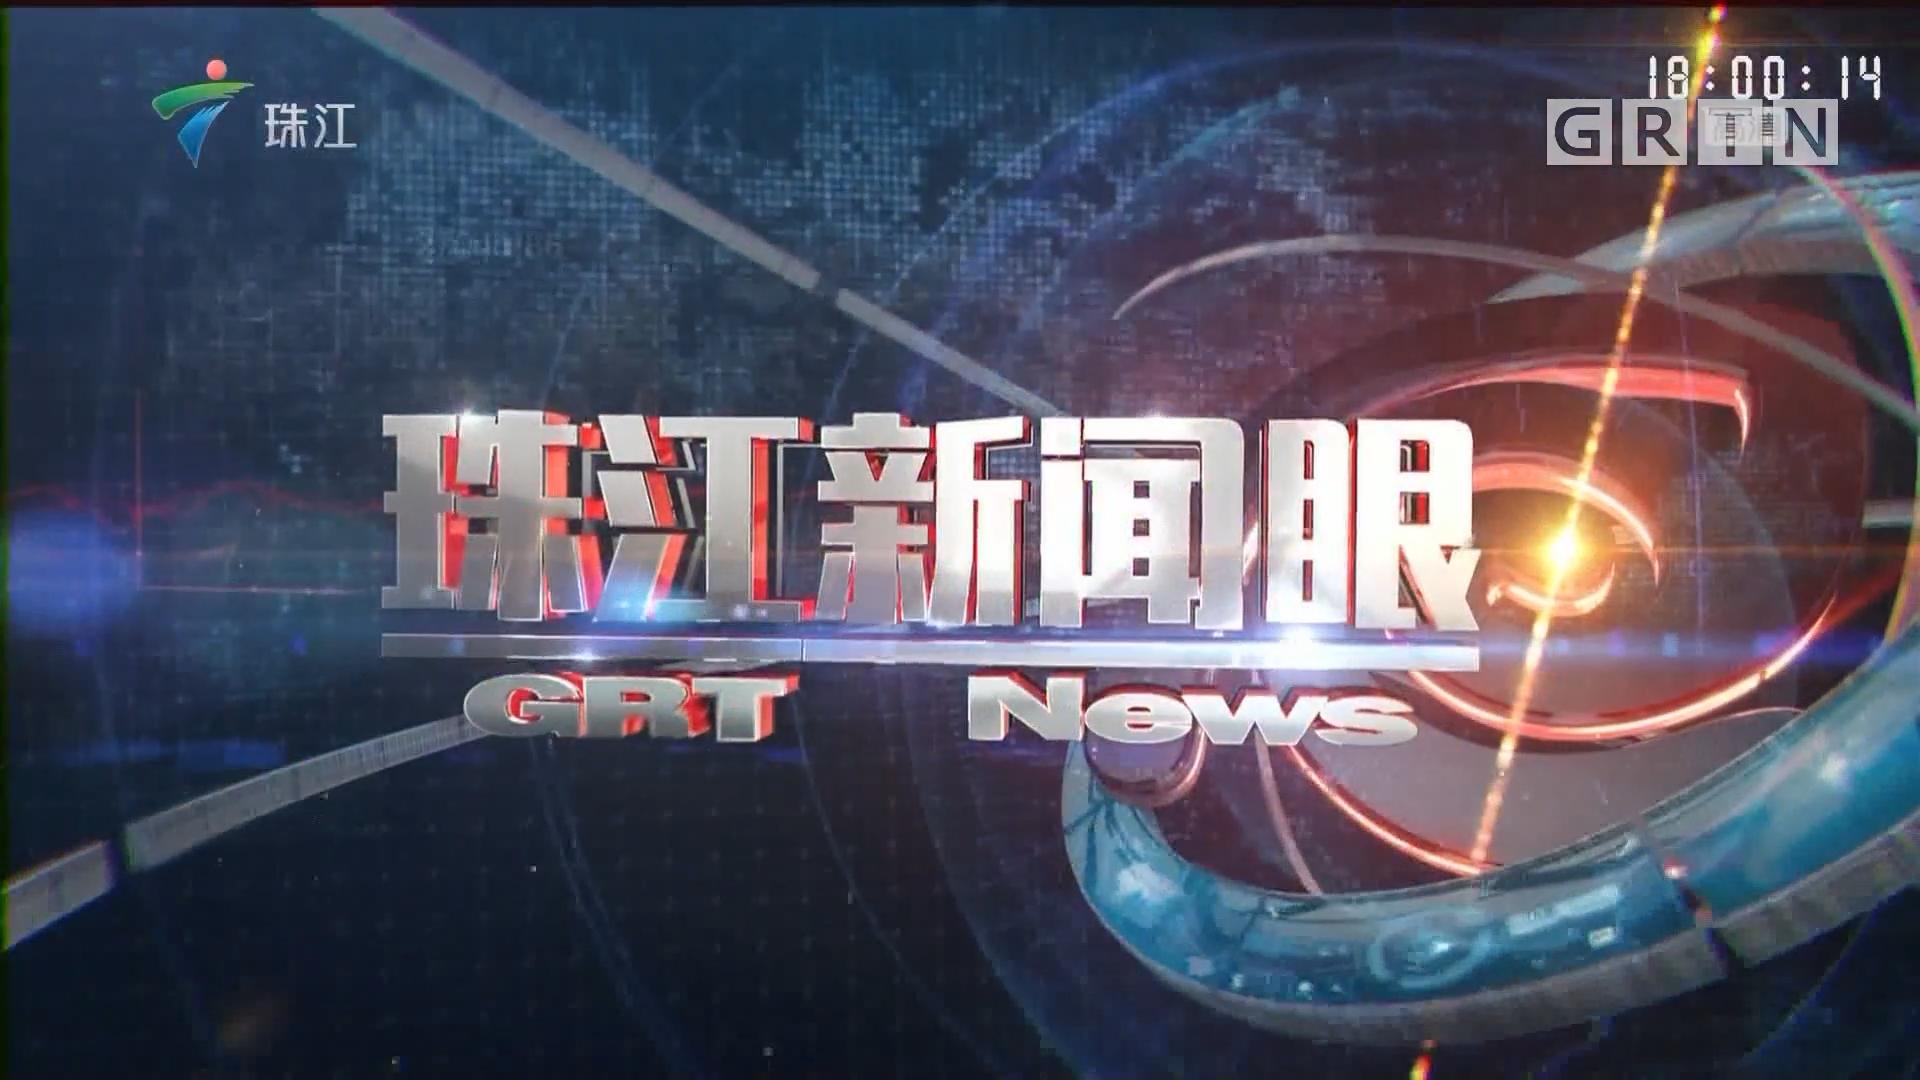 [HD][2019-02-14]珠江新闻眼:推进粤港澳大湾区建设 深圳31个重大项目开工